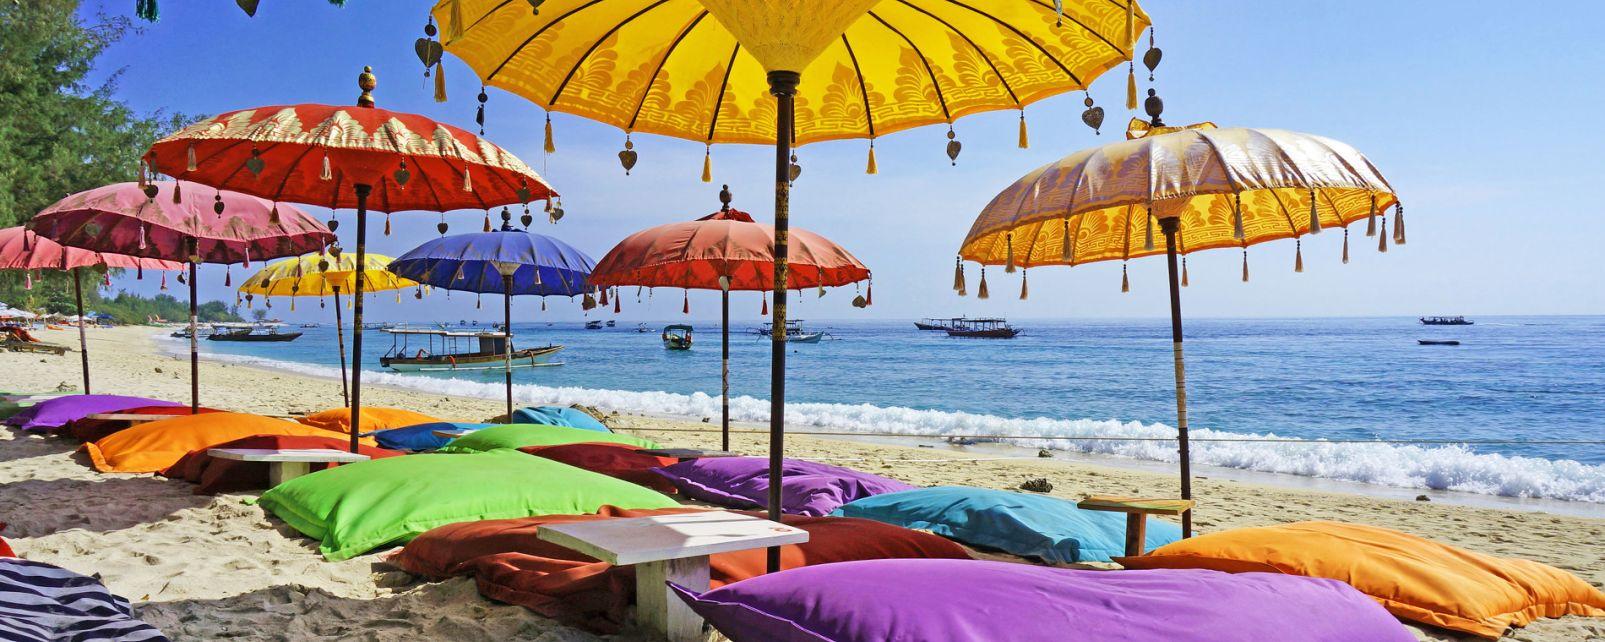 , Les îles Gili, Les côtes, Lombok